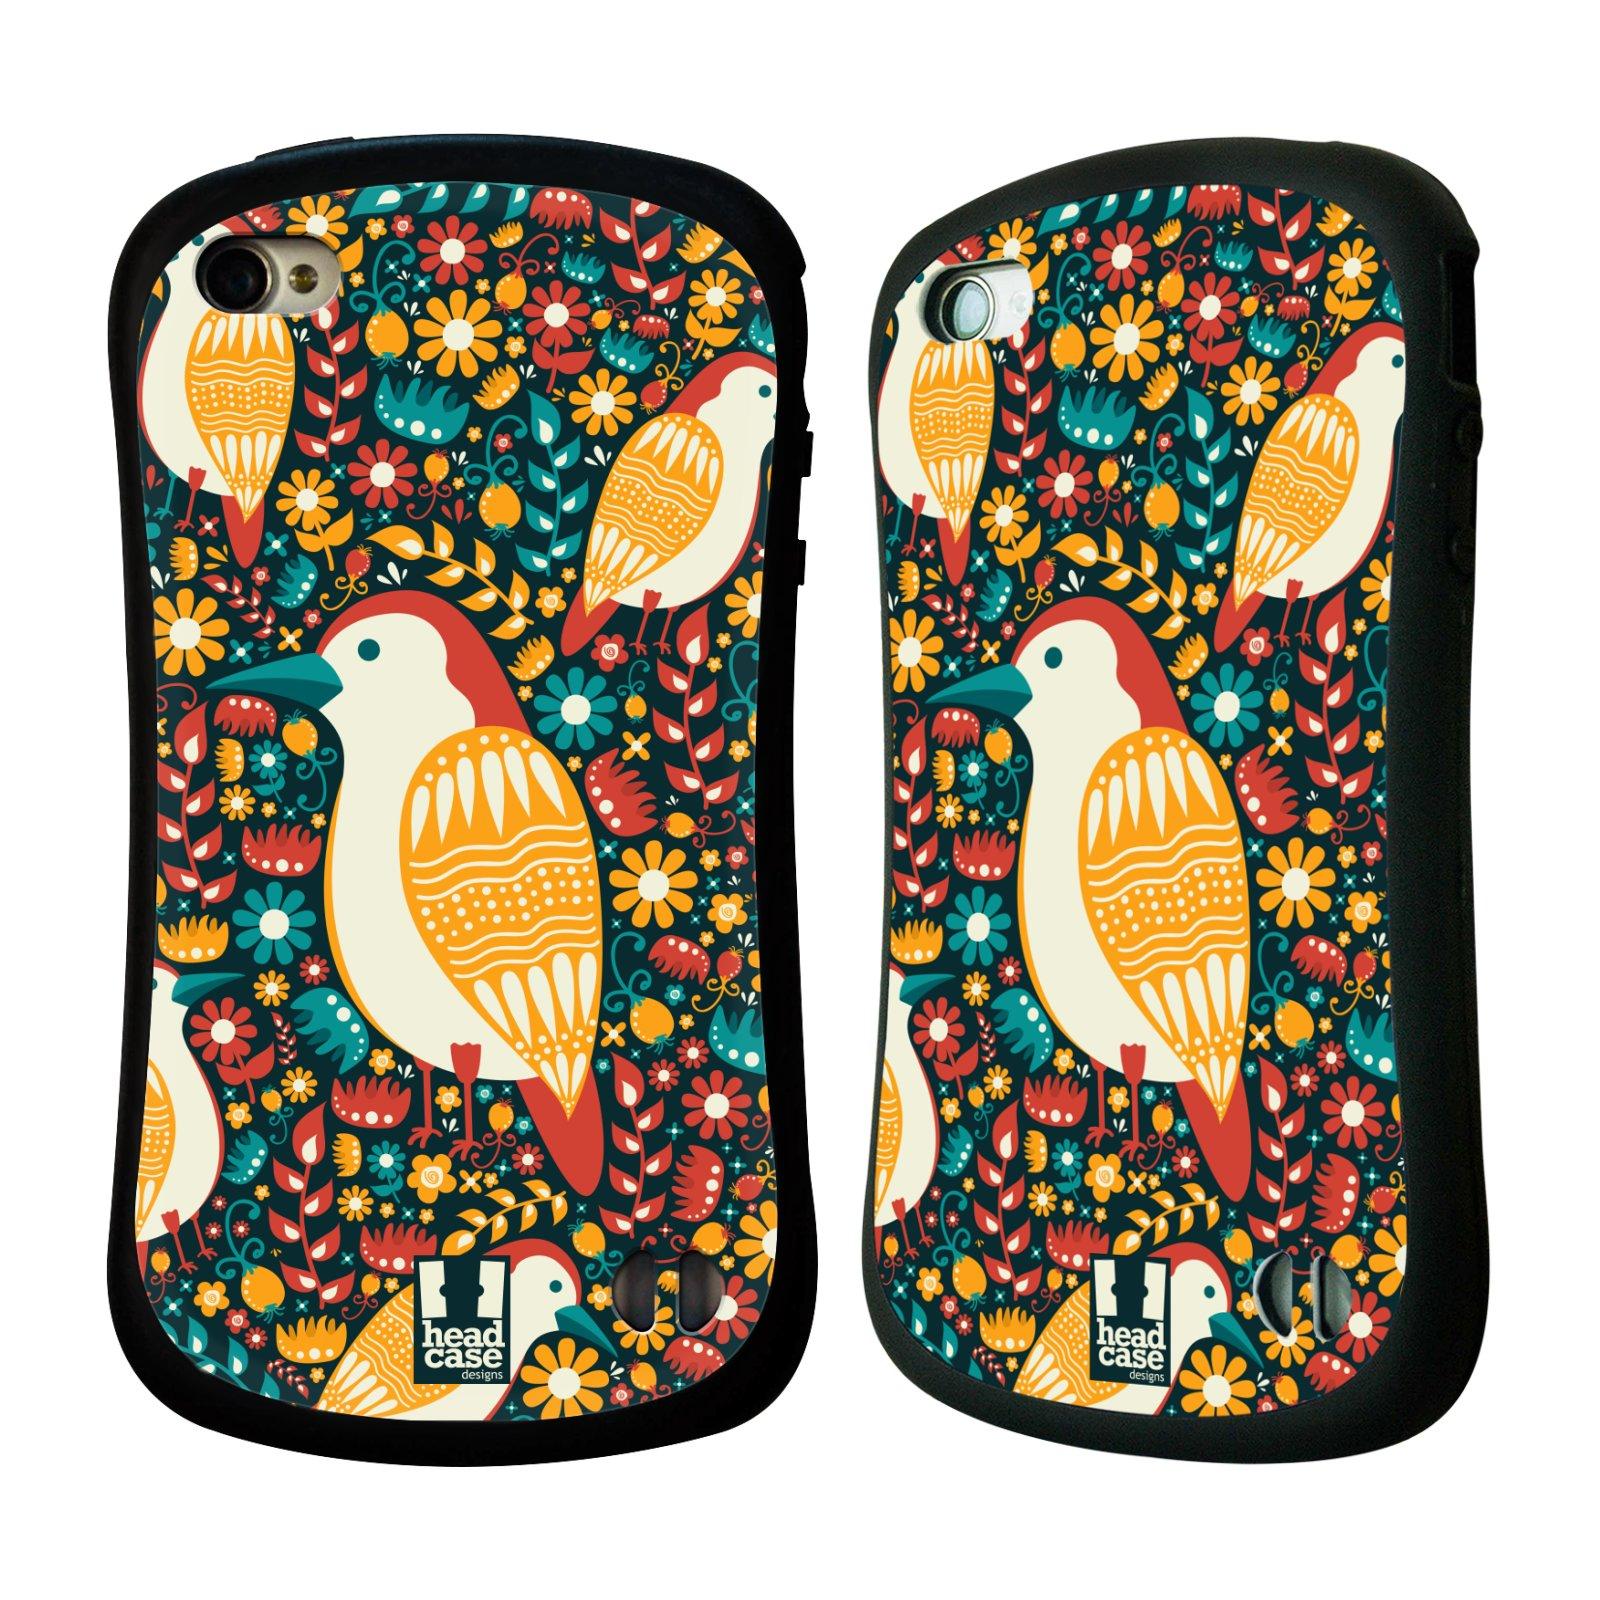 HEAD CASE silikon/plast odolný obal na mobil Apple Iphone 4/4S vzor kreslení ptáci datel